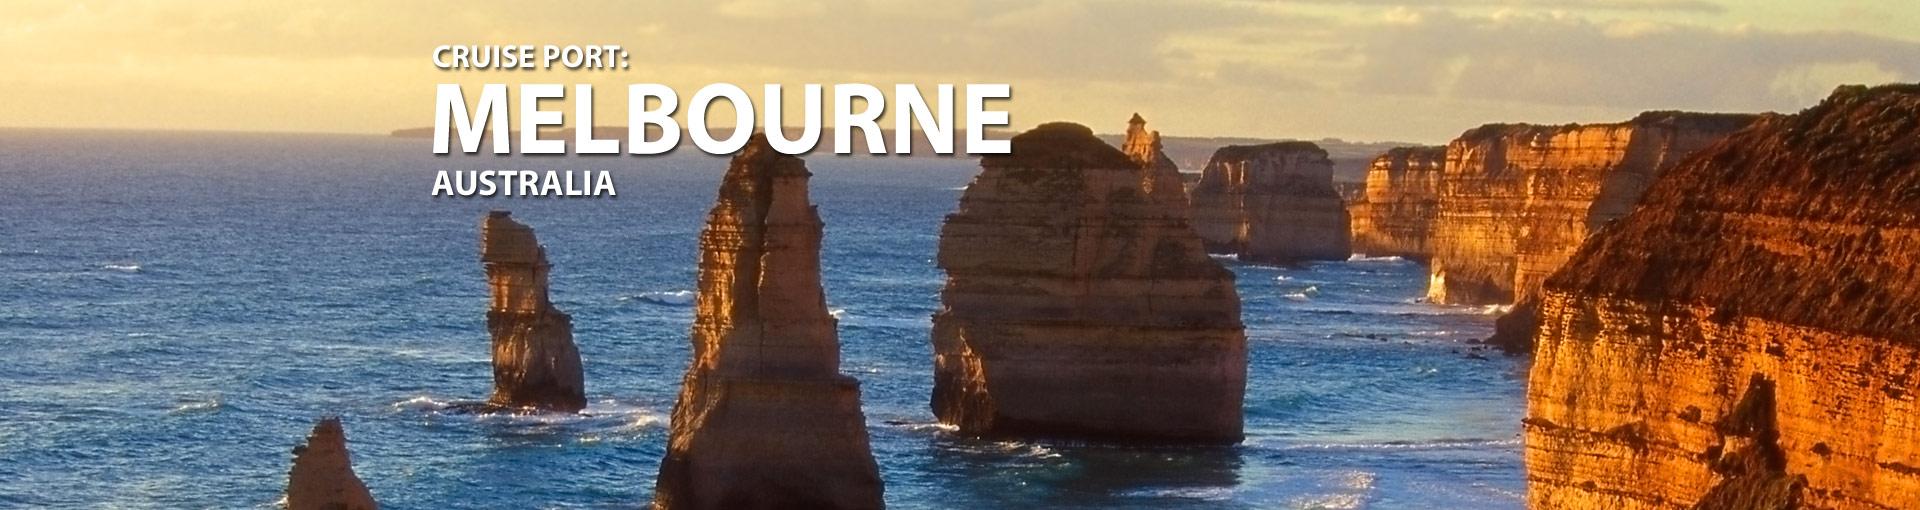 Cruises from Melbourne, Australia